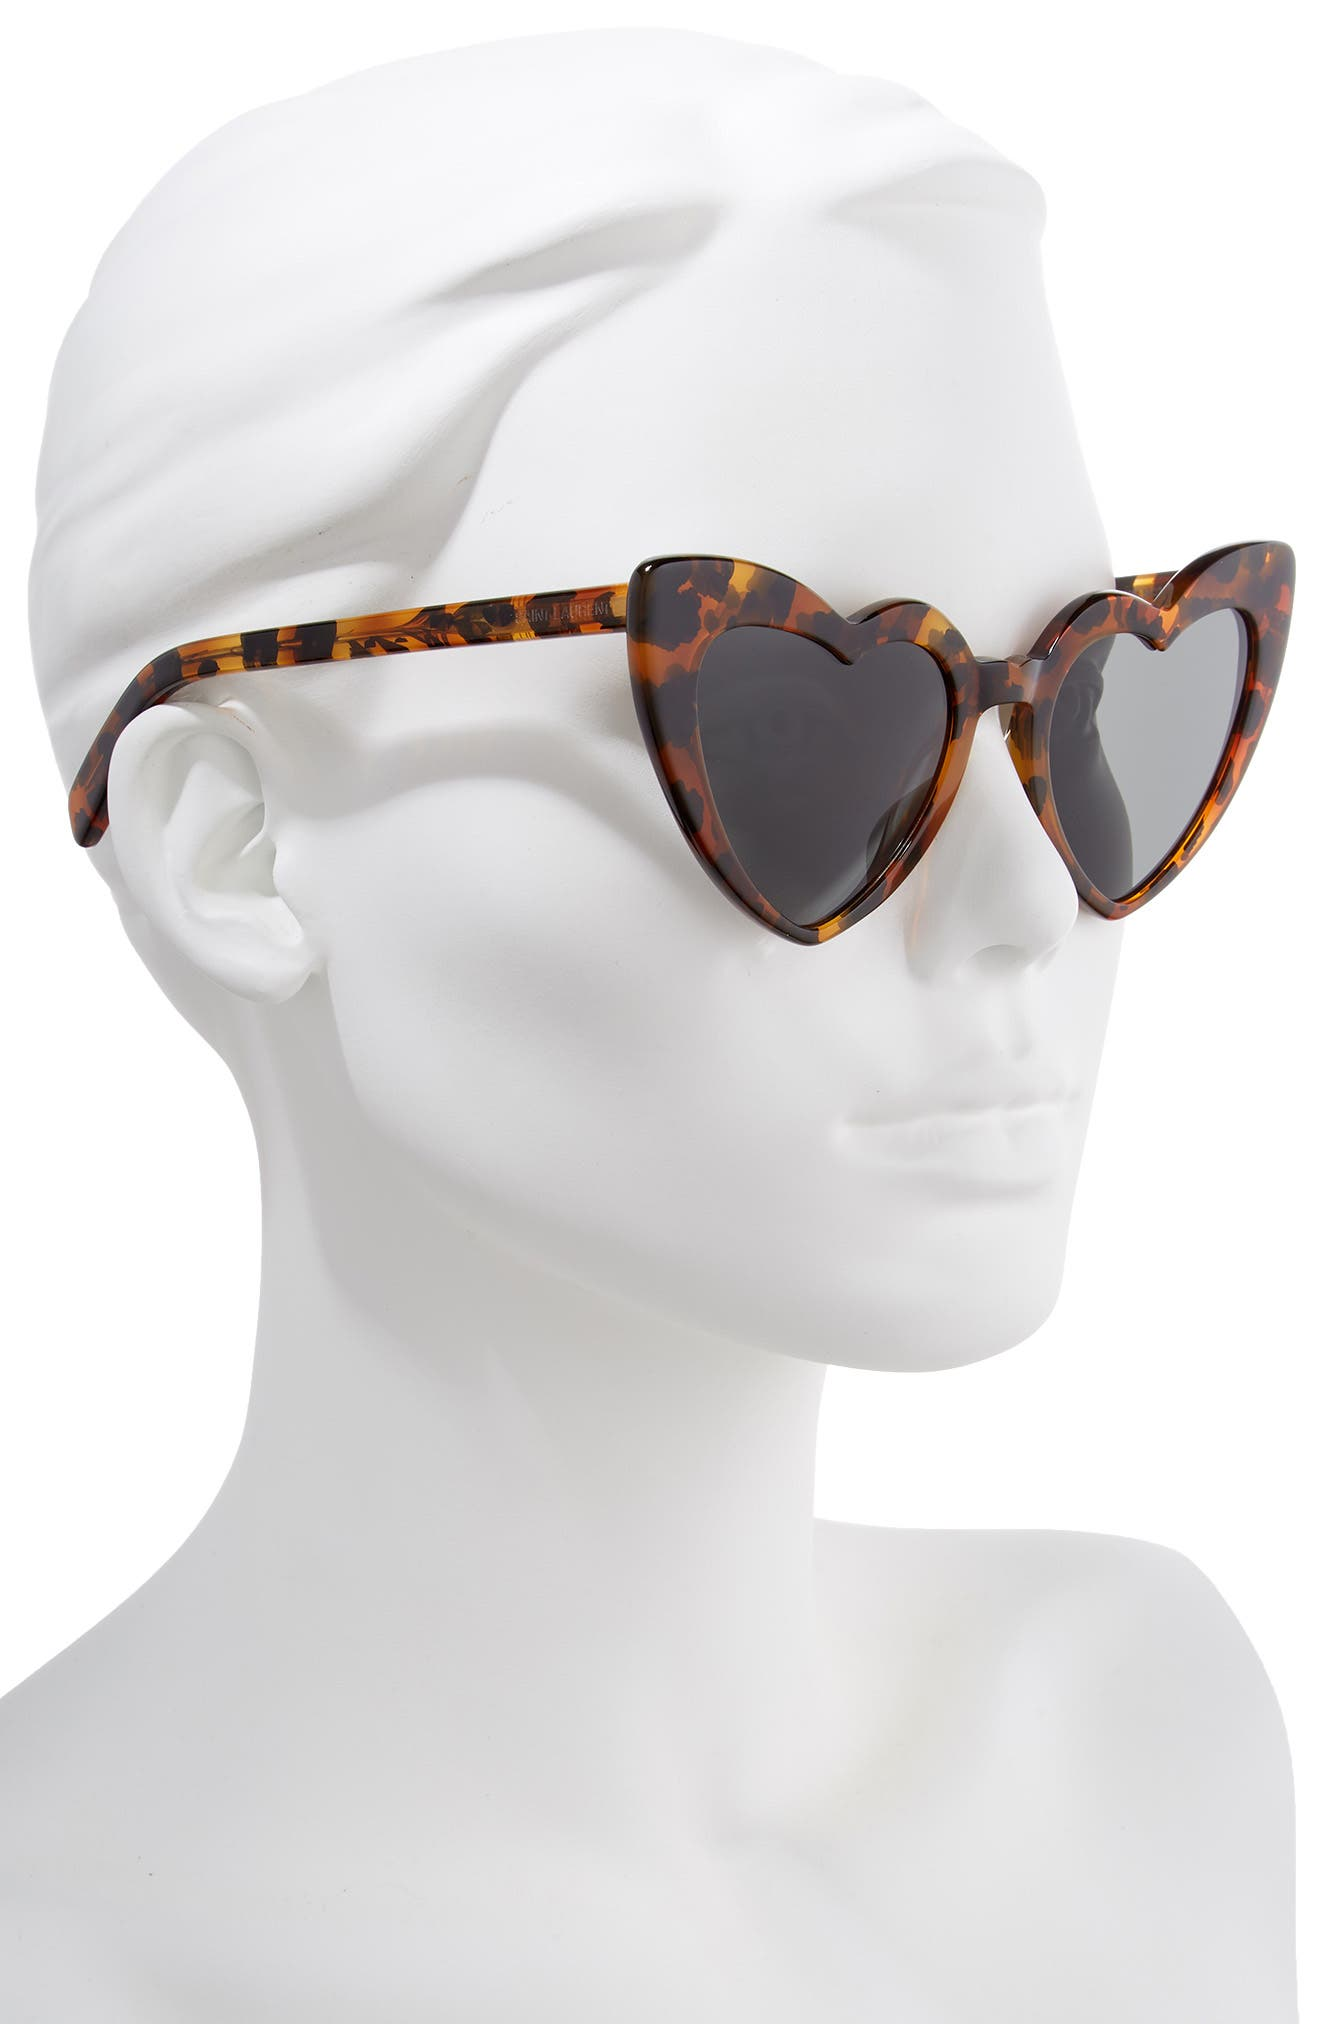 Loulou 54mm Heart Sunglasses,                             Alternate thumbnail 2, color,                             LEOPARD HAVANA/ GREY